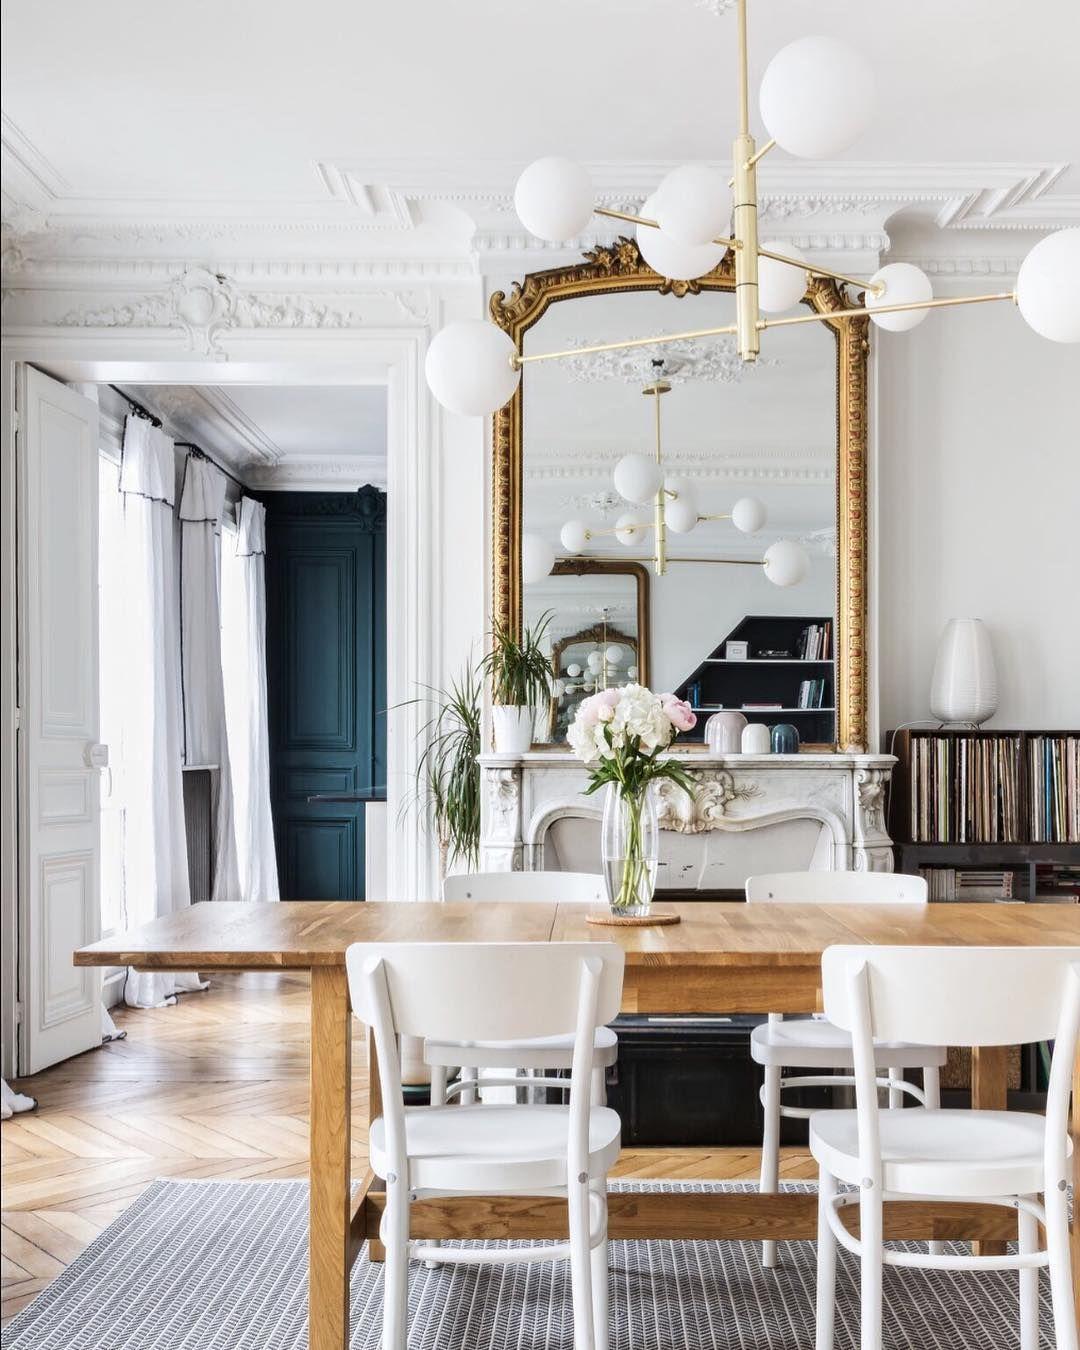 Caroline andréoni on instagram projet décoration rue de maubeuge paris 9ème 📷 sophie lloyd interiordesign interior interiors design